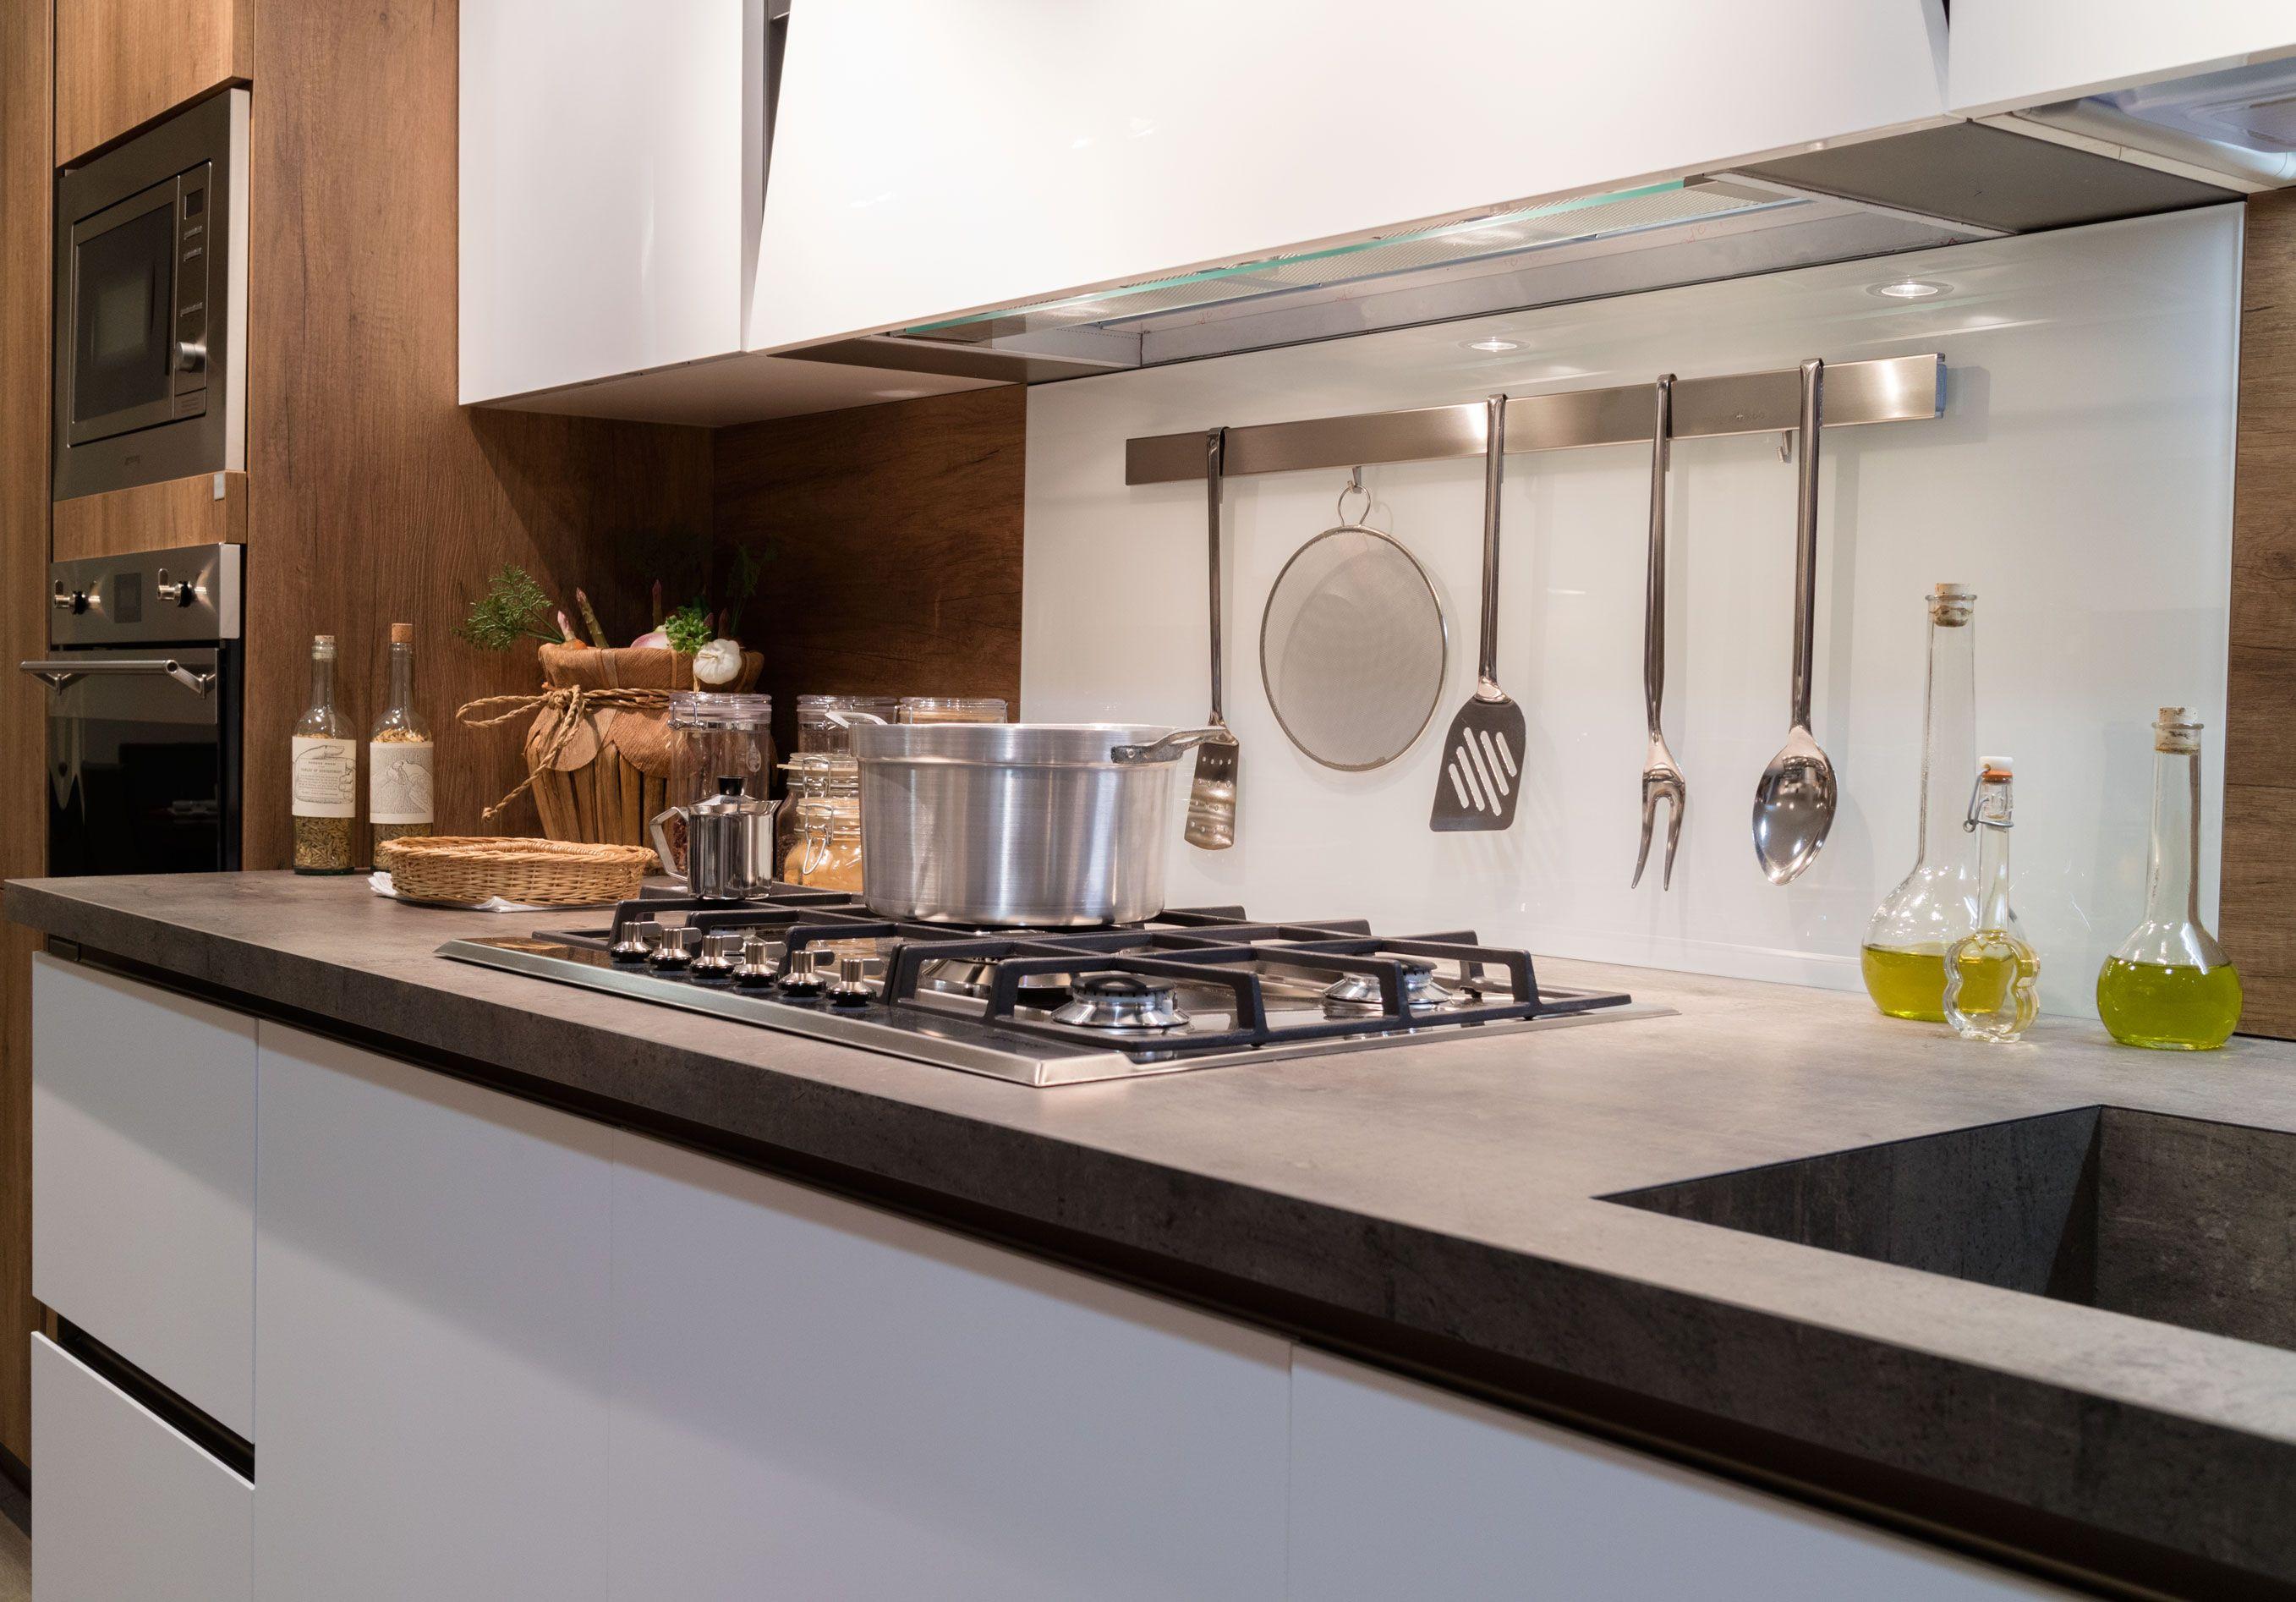 Cucina pianohpl hpl laccato moderno contemporaneo vintage